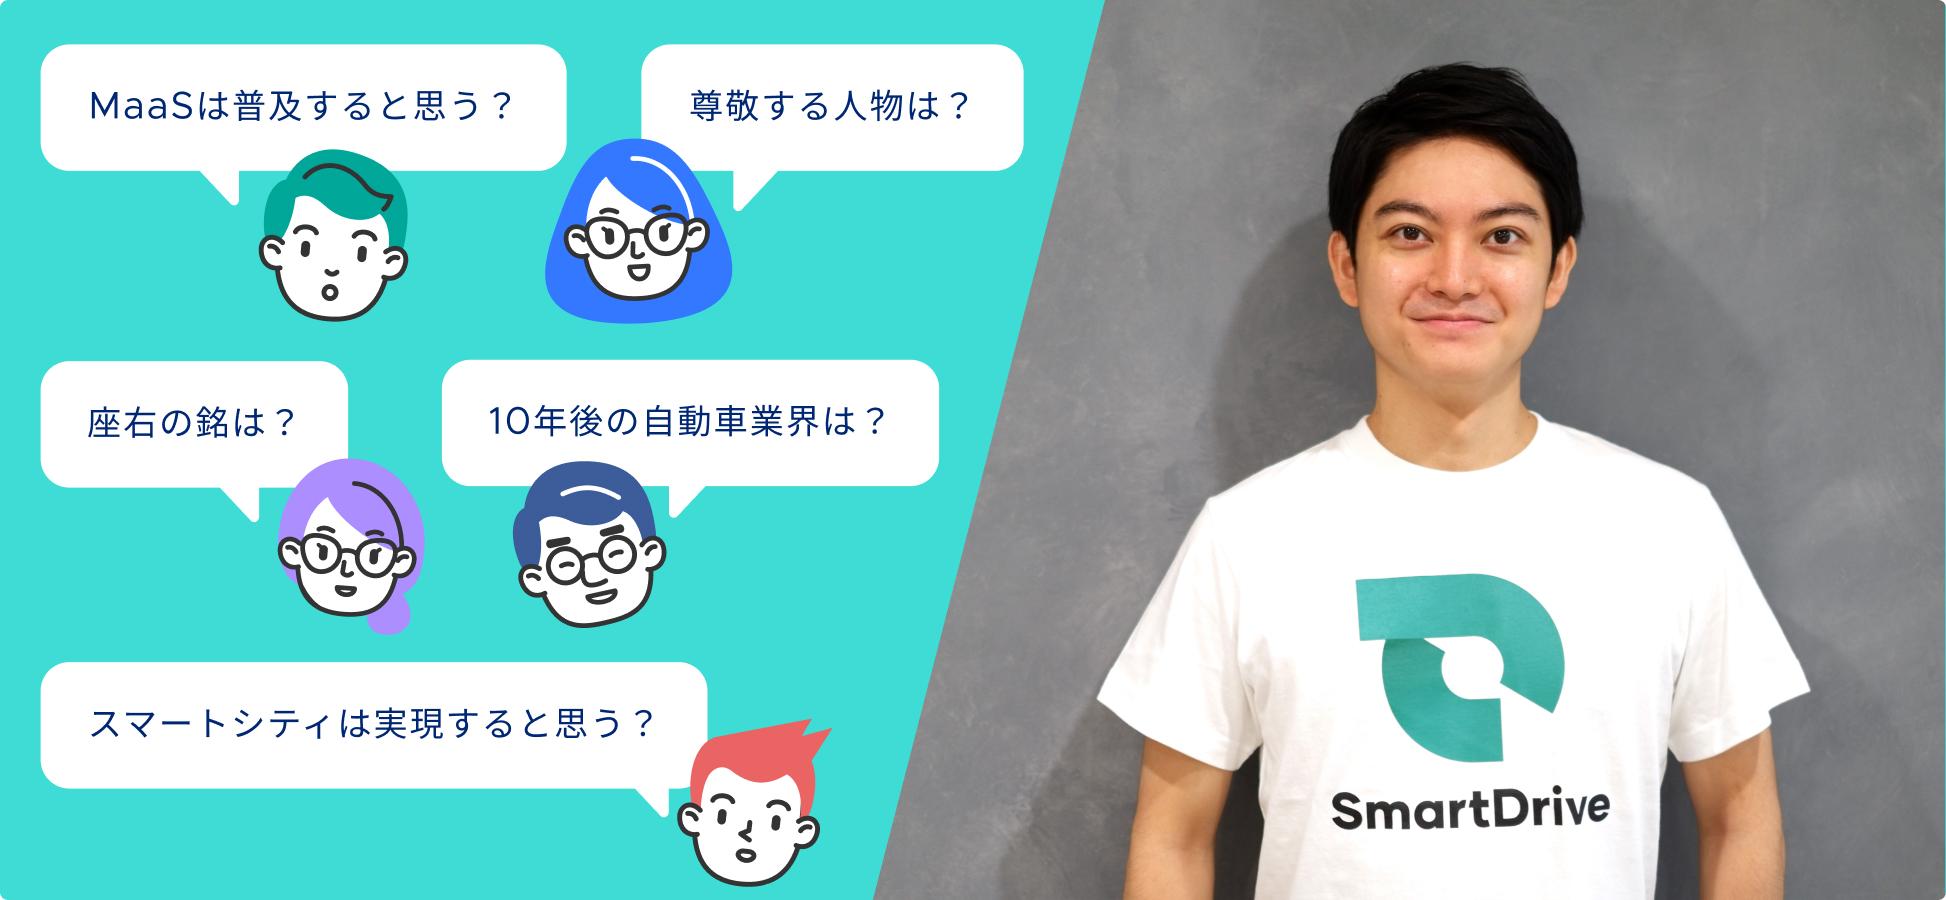 Mobility Transformation MeetUp Vol.1 「スマートドライブ代表 北川烈へ聞きたいことありますか?」イベントレポート